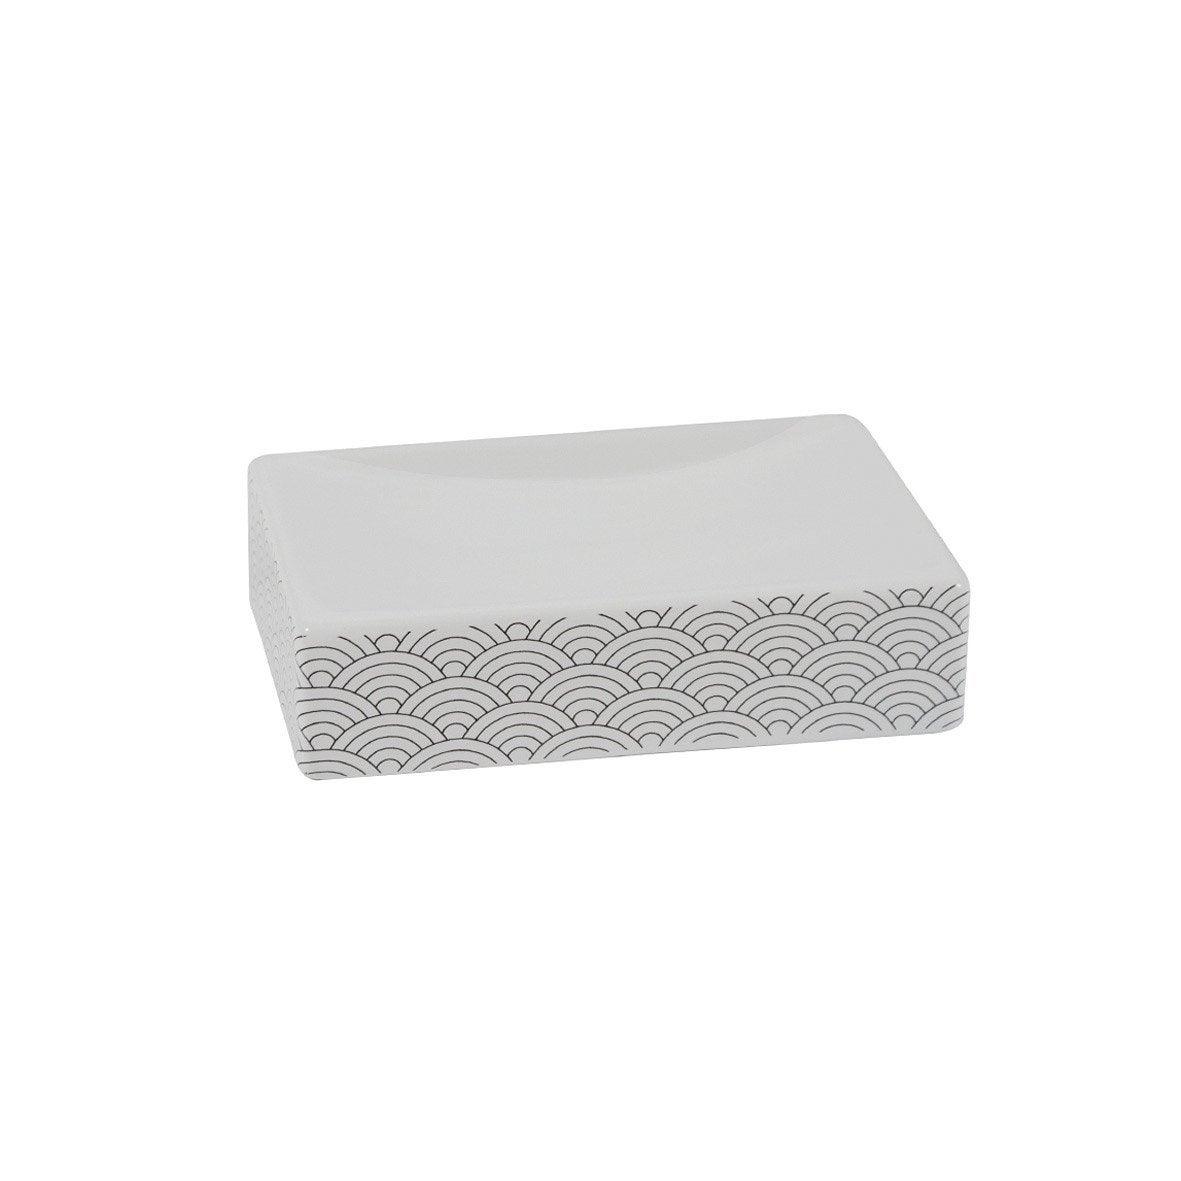 Porte-savon céramique Okino, noir et blanc